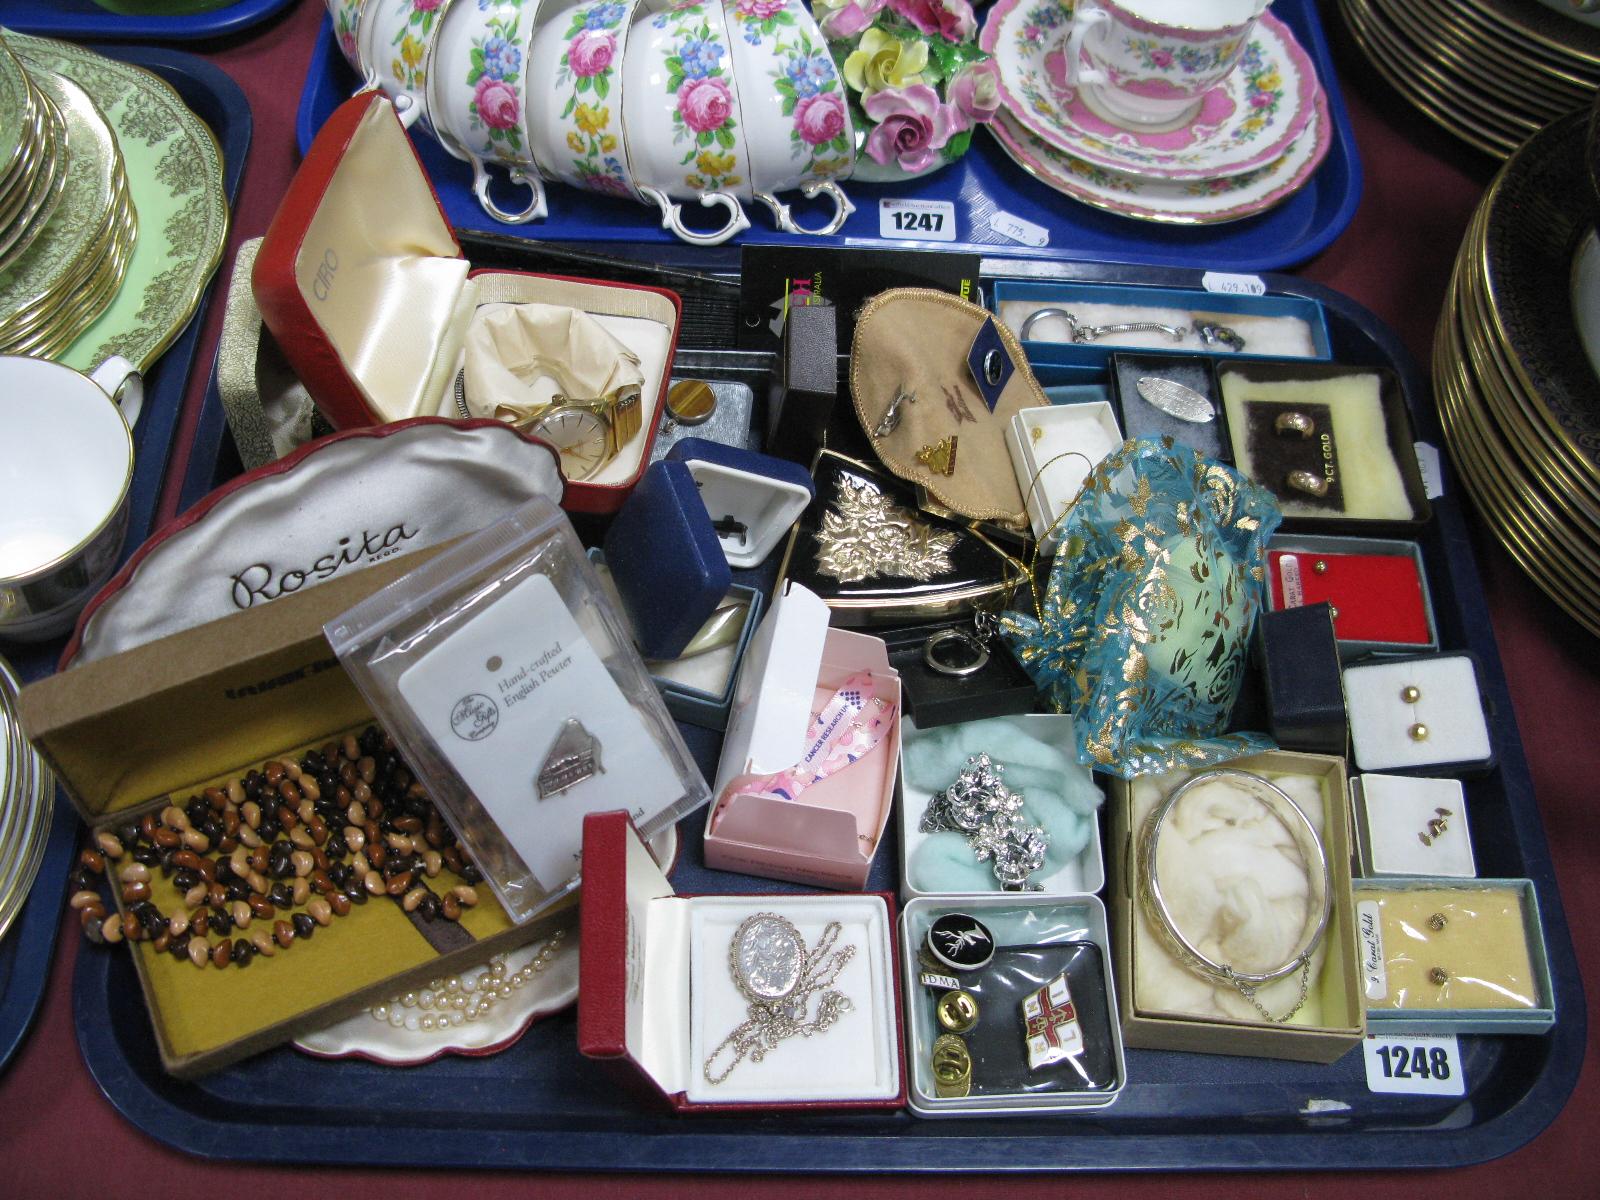 Lot 1248 - Assorted Costume Jewellery, including earrings, beads, ladies fan, gent's wristwatch, etc:- One